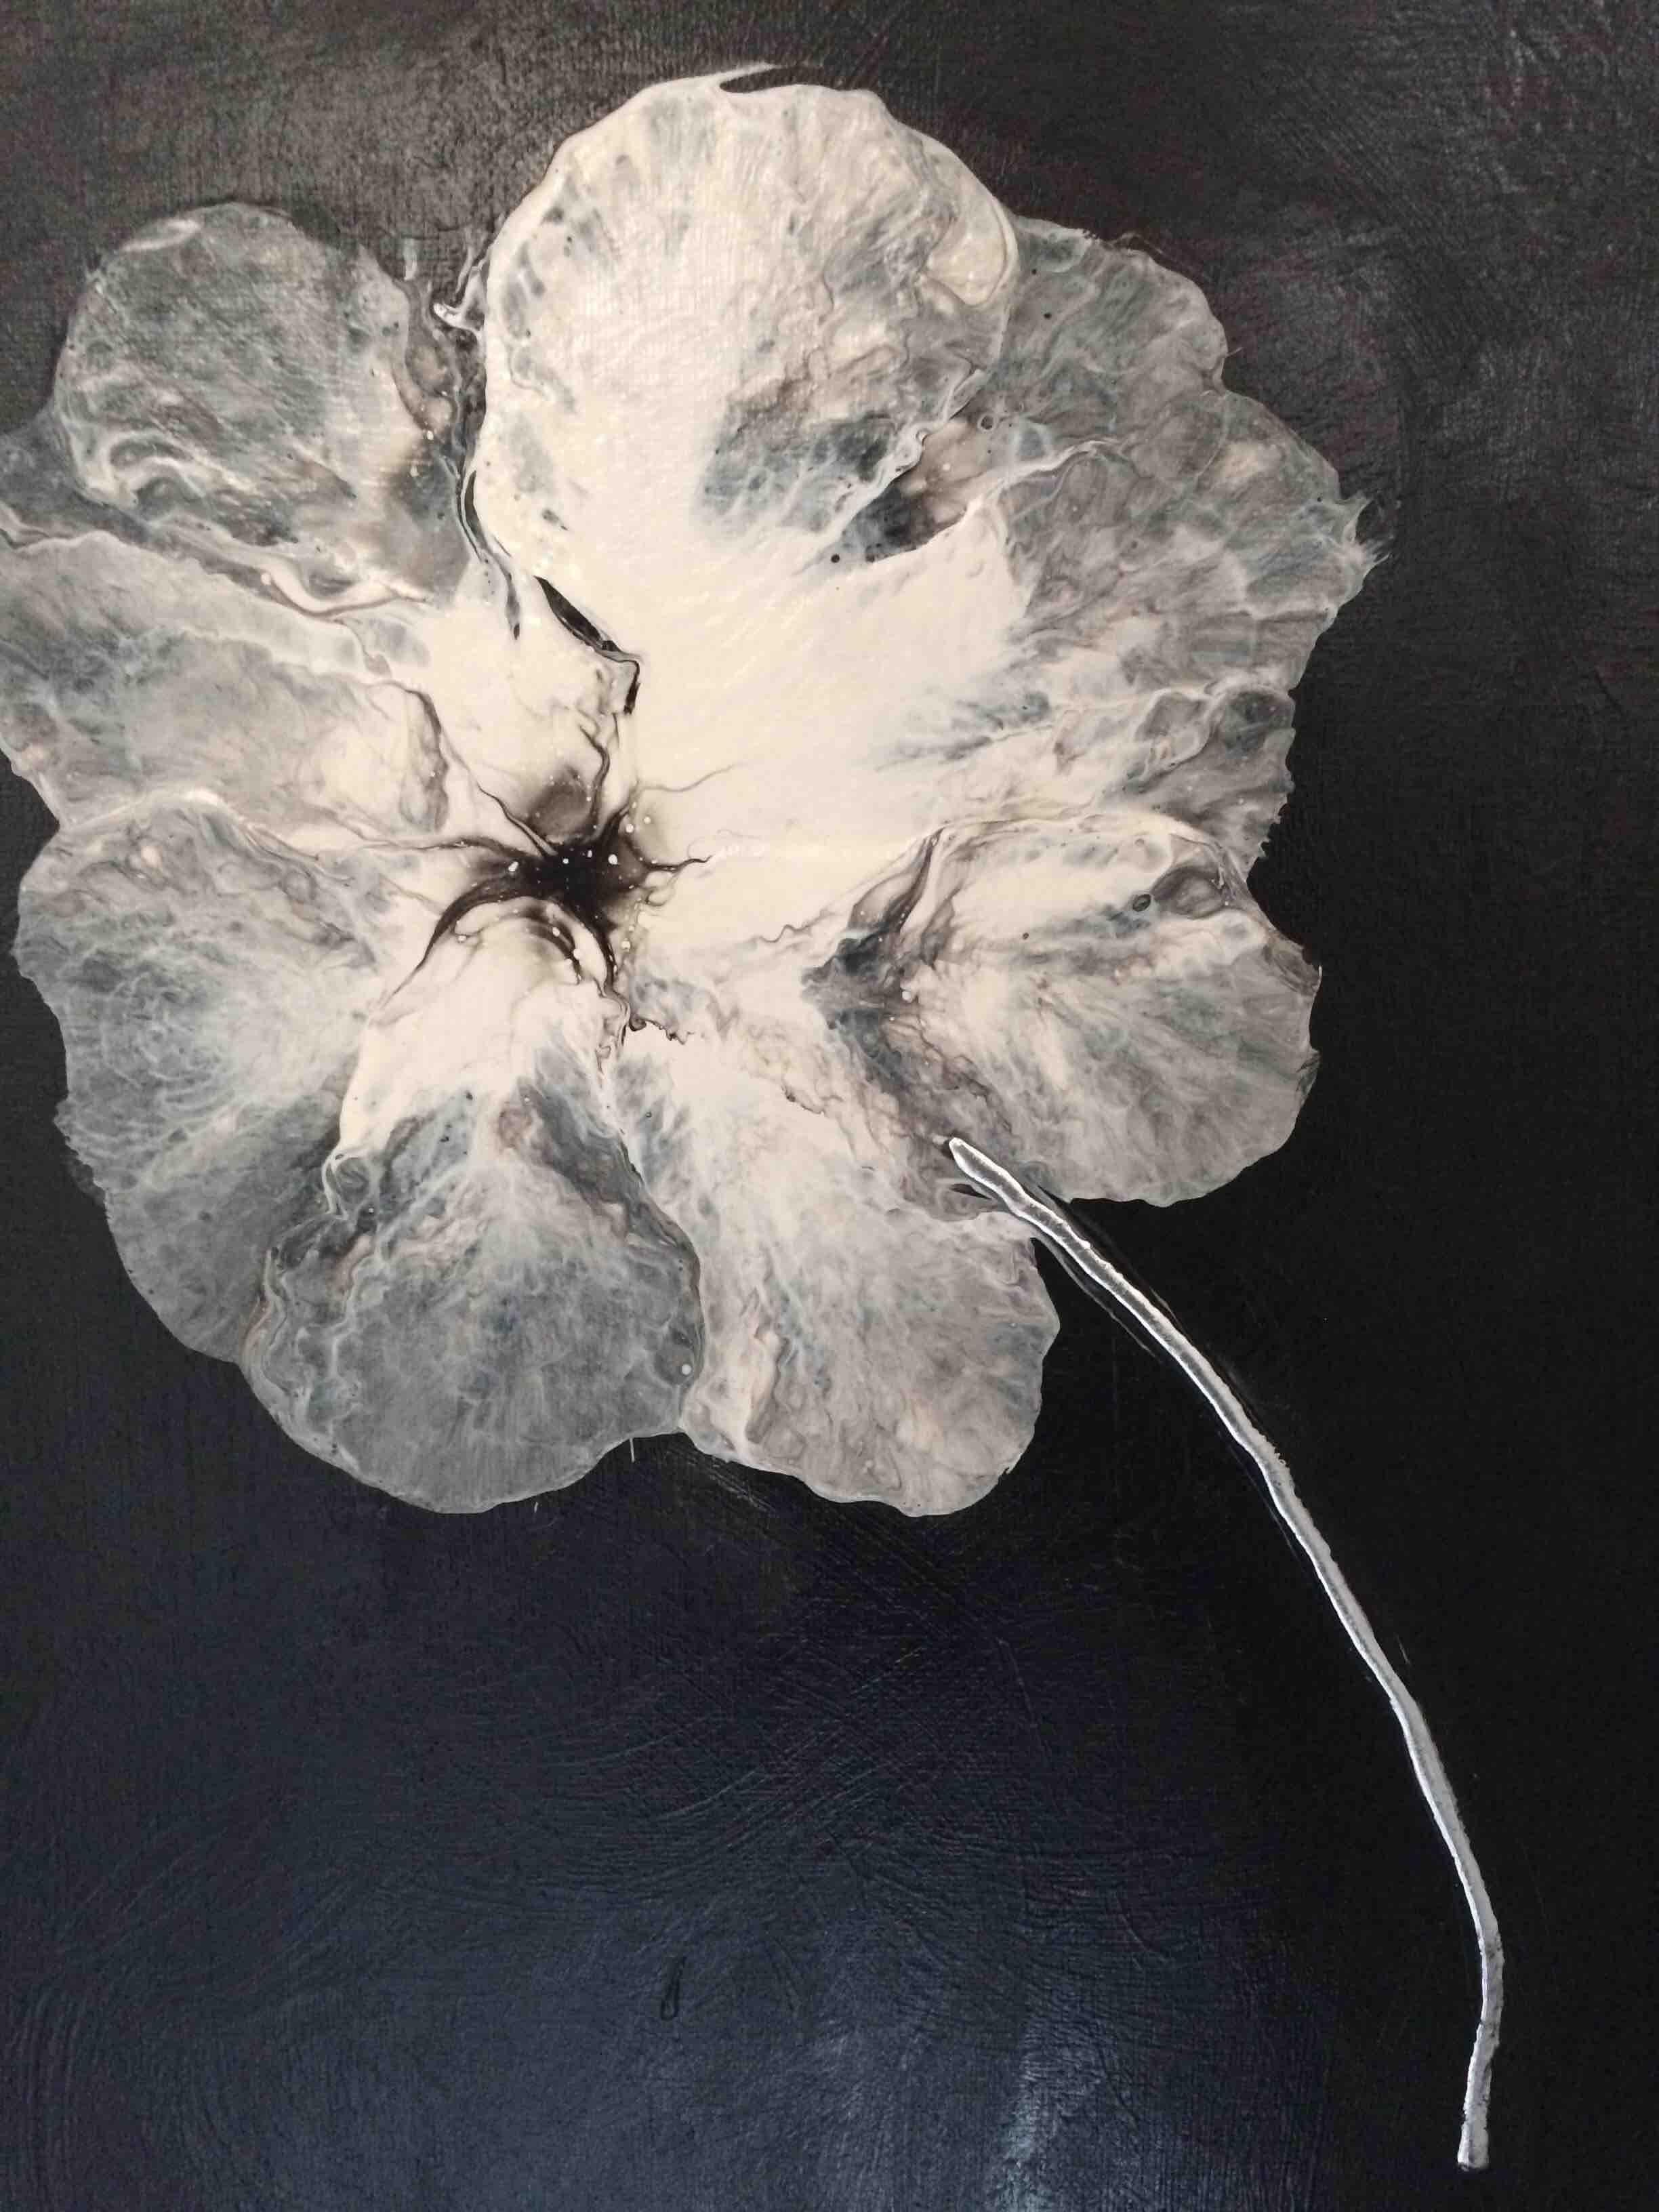 Tableau Fleurs Noires & Blanches - nathaliedeffrene